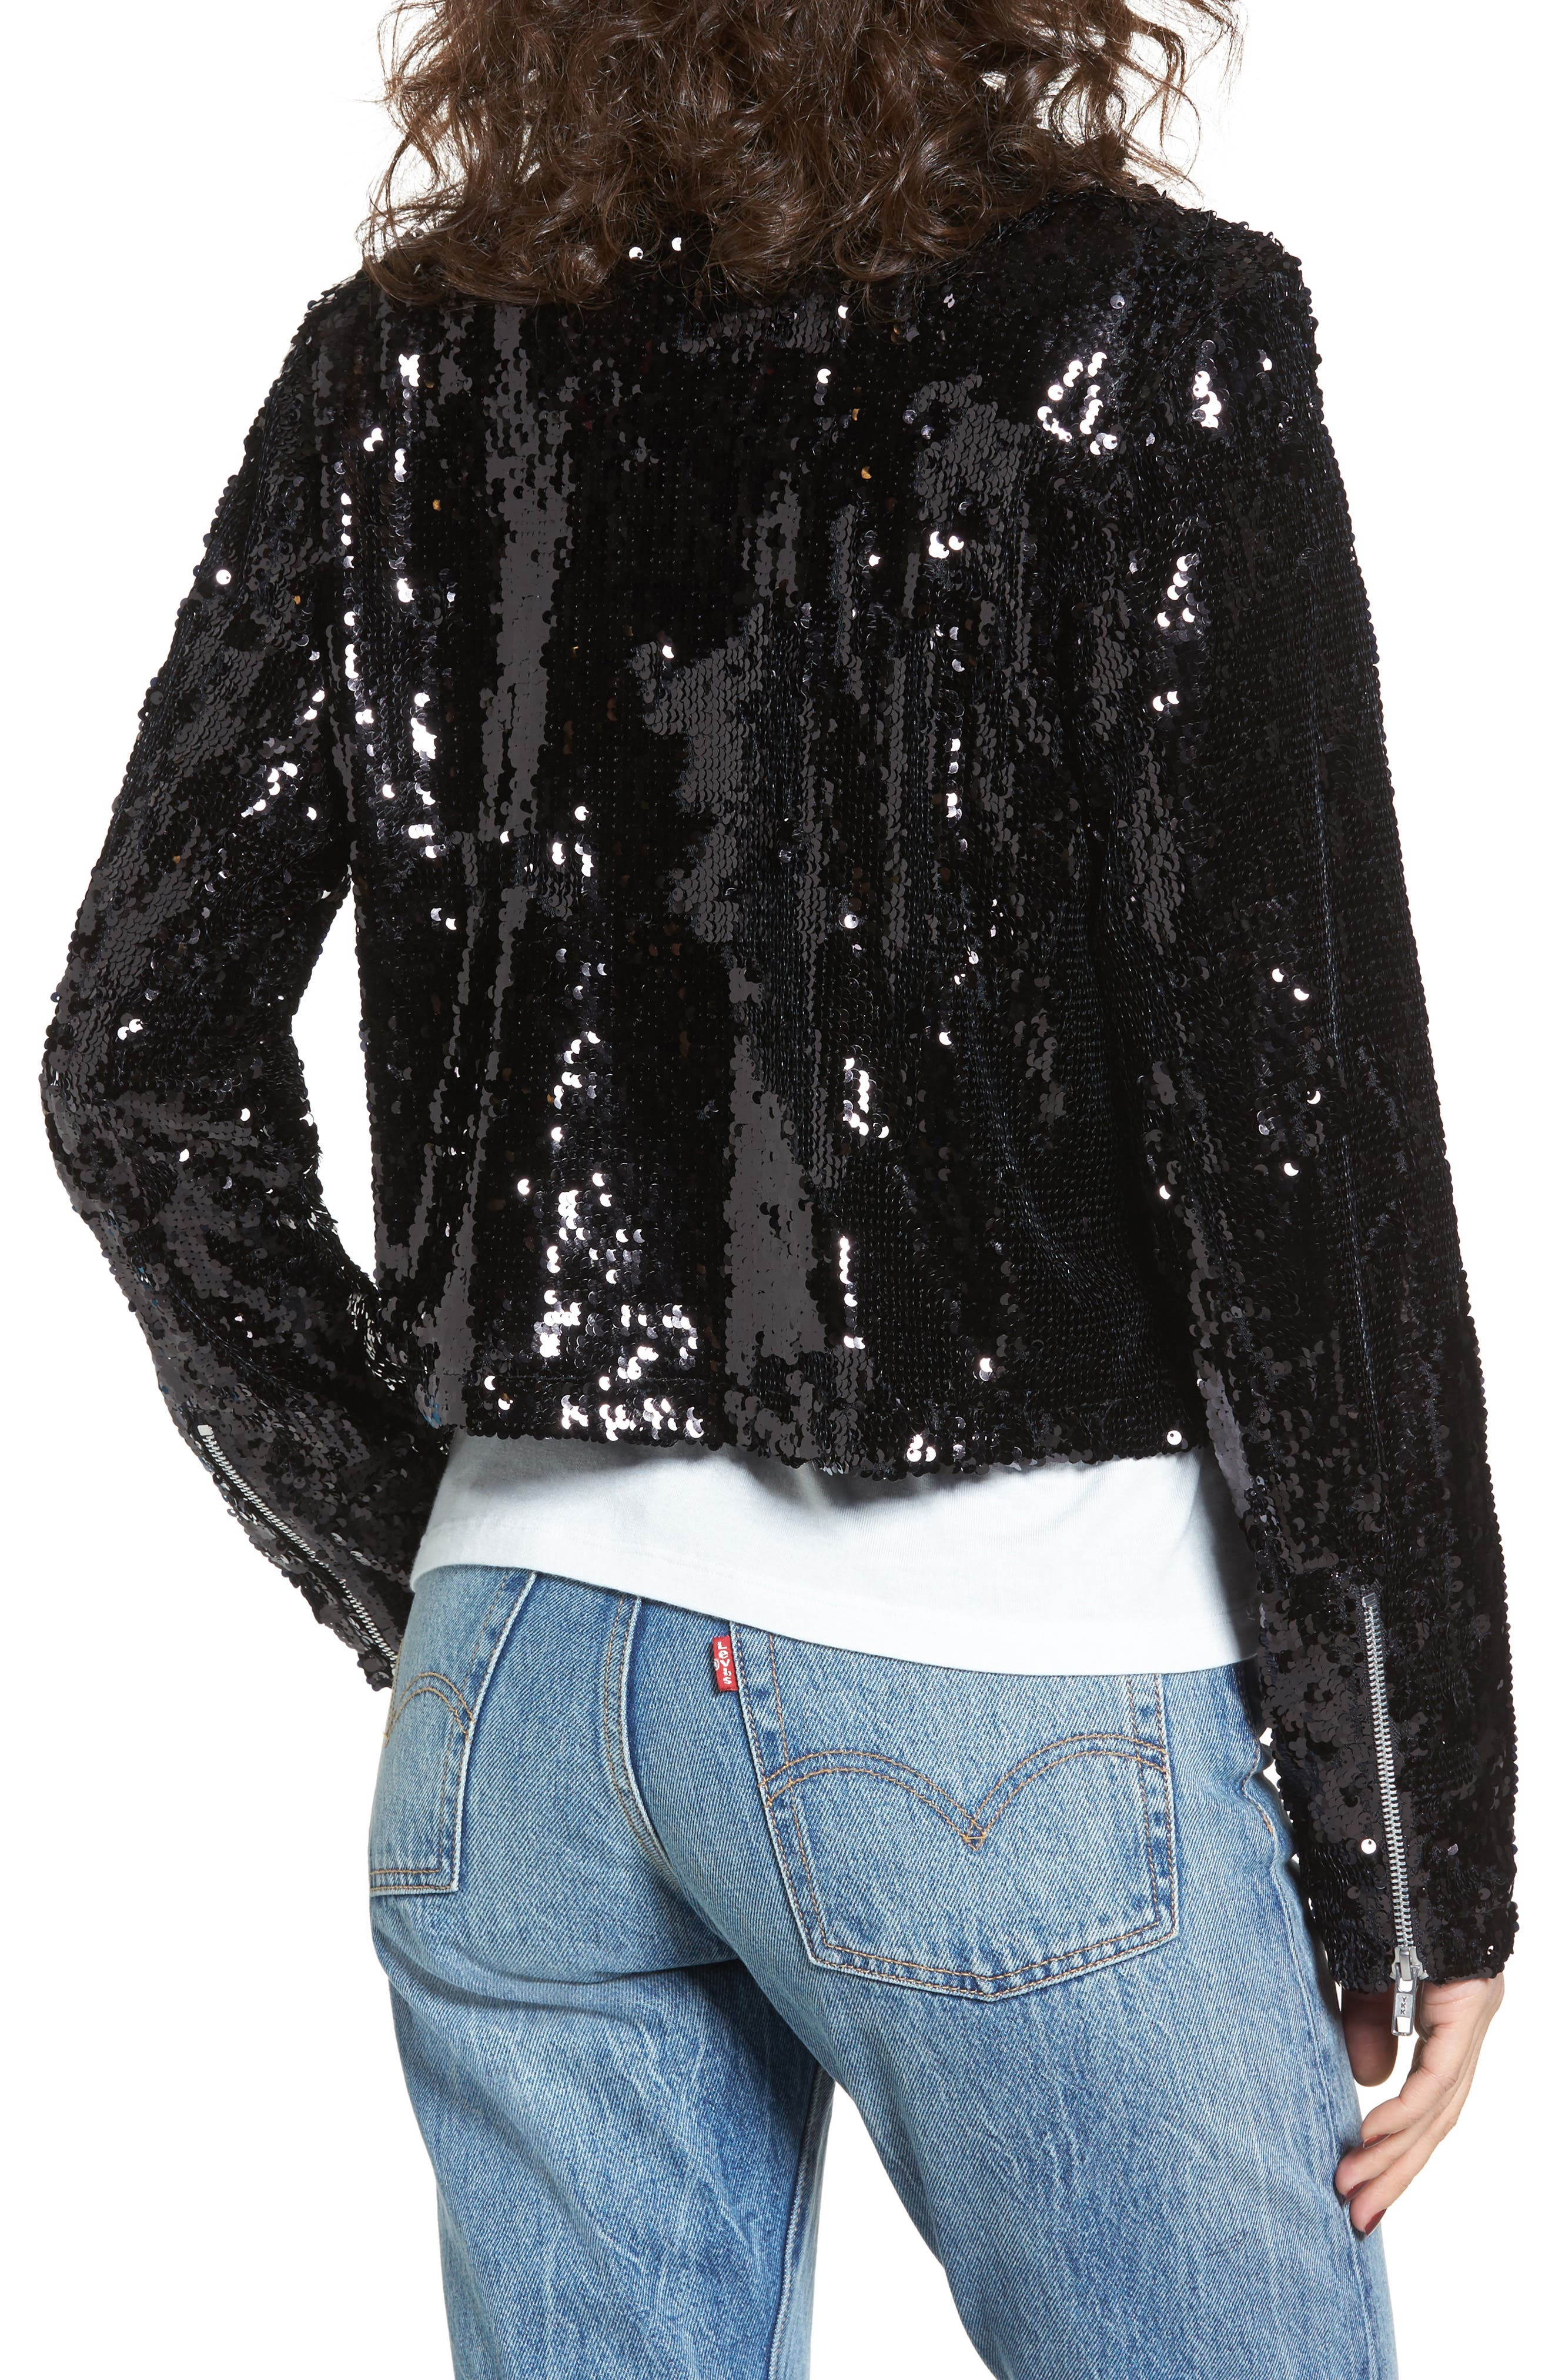 Bigby Sequin Moto Jacket,                             Alternate thumbnail 2, color,                             Black